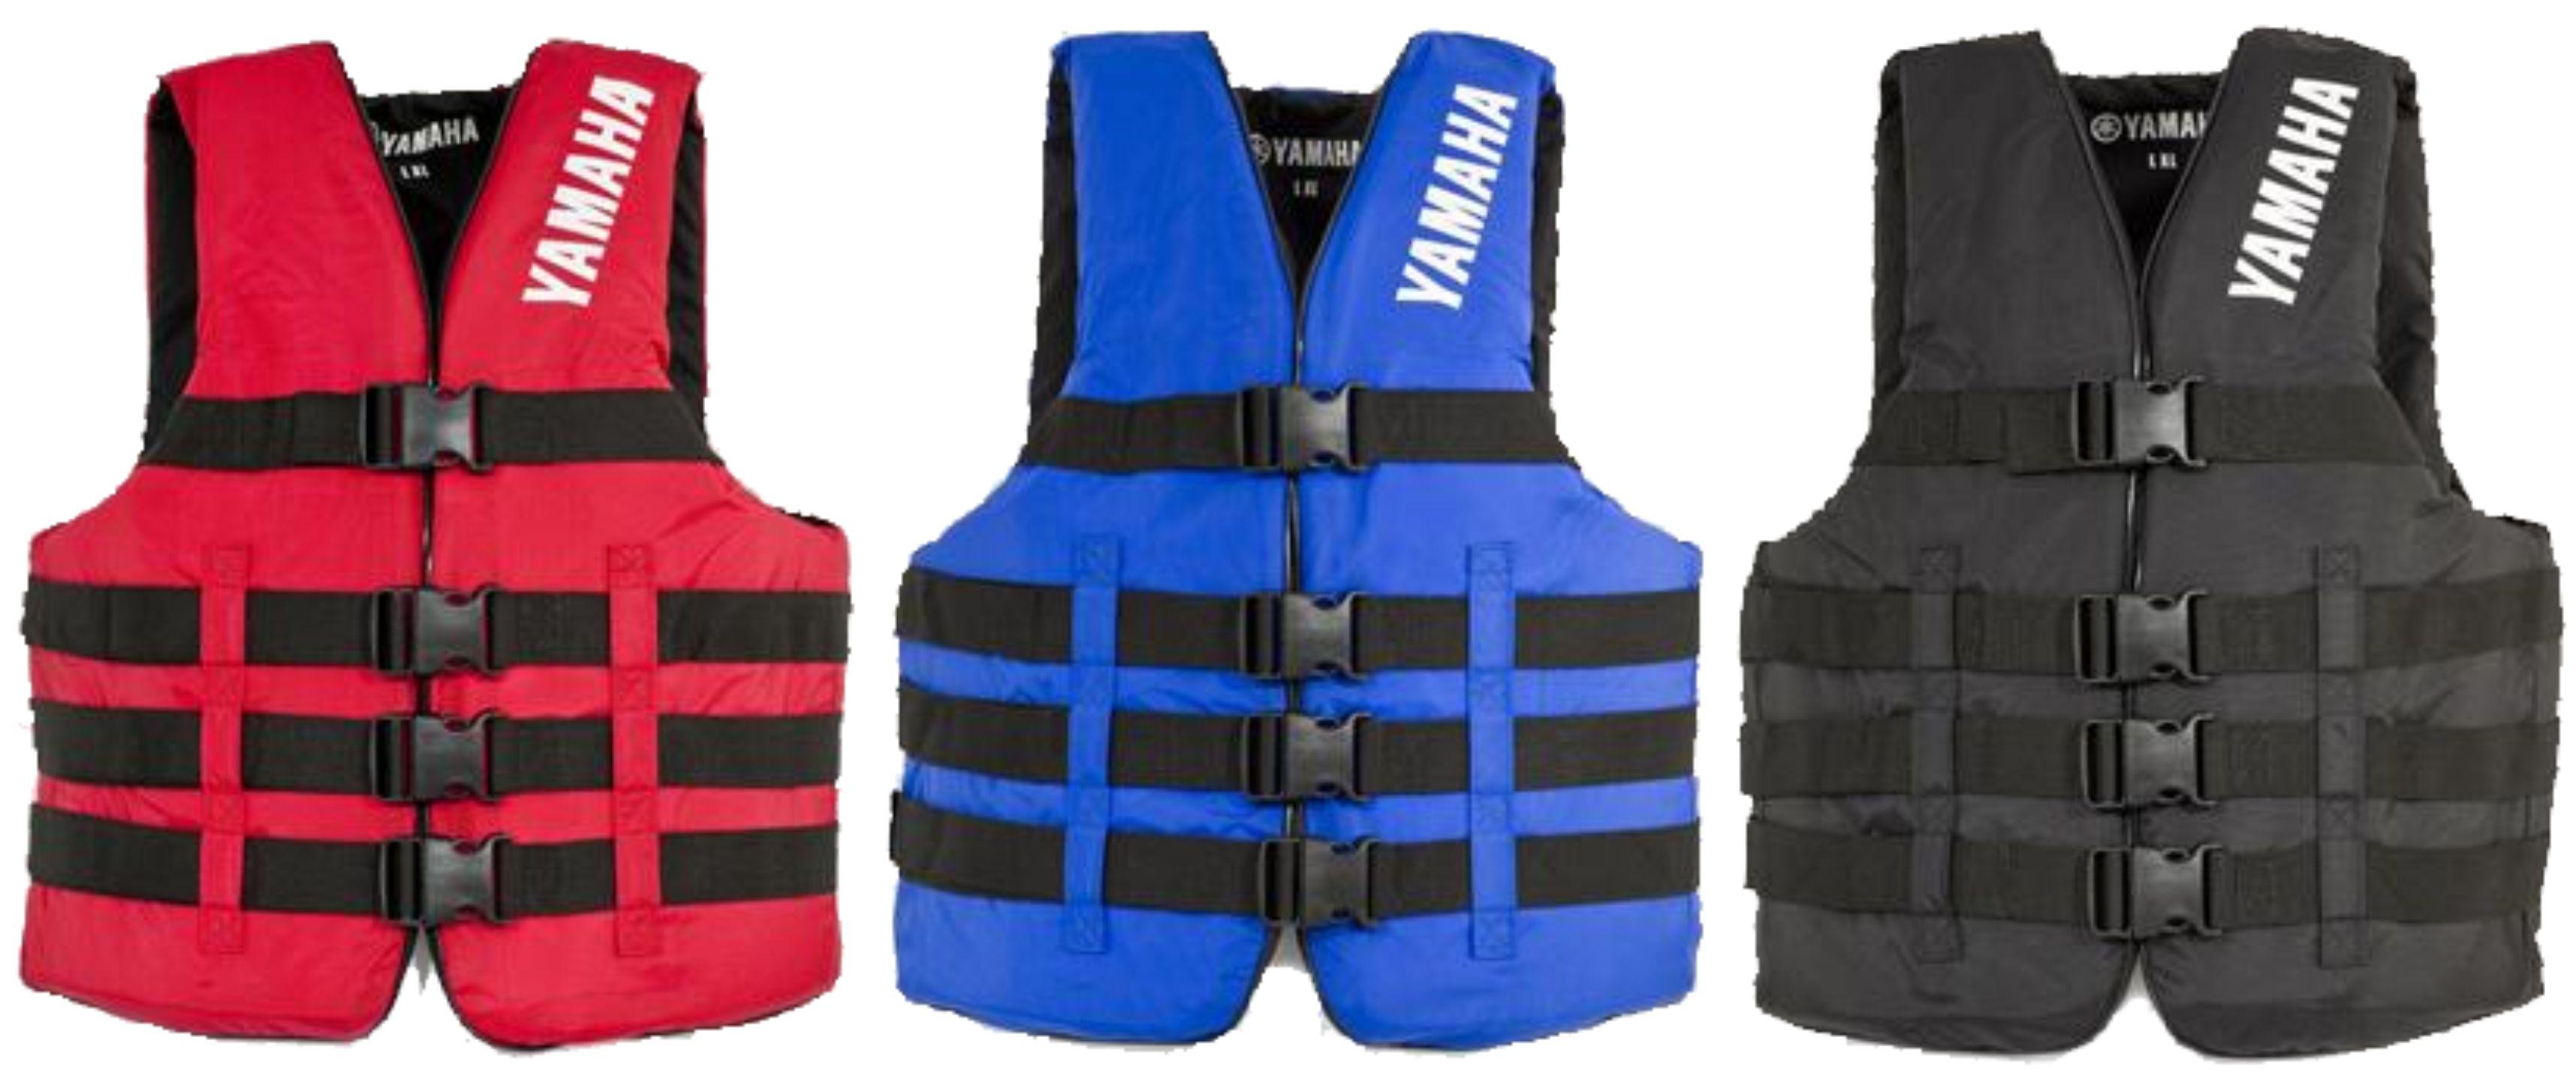 Oem Yamaha Nylon Value 4 Buckle Life Jacket Vest Pfd Blue Small